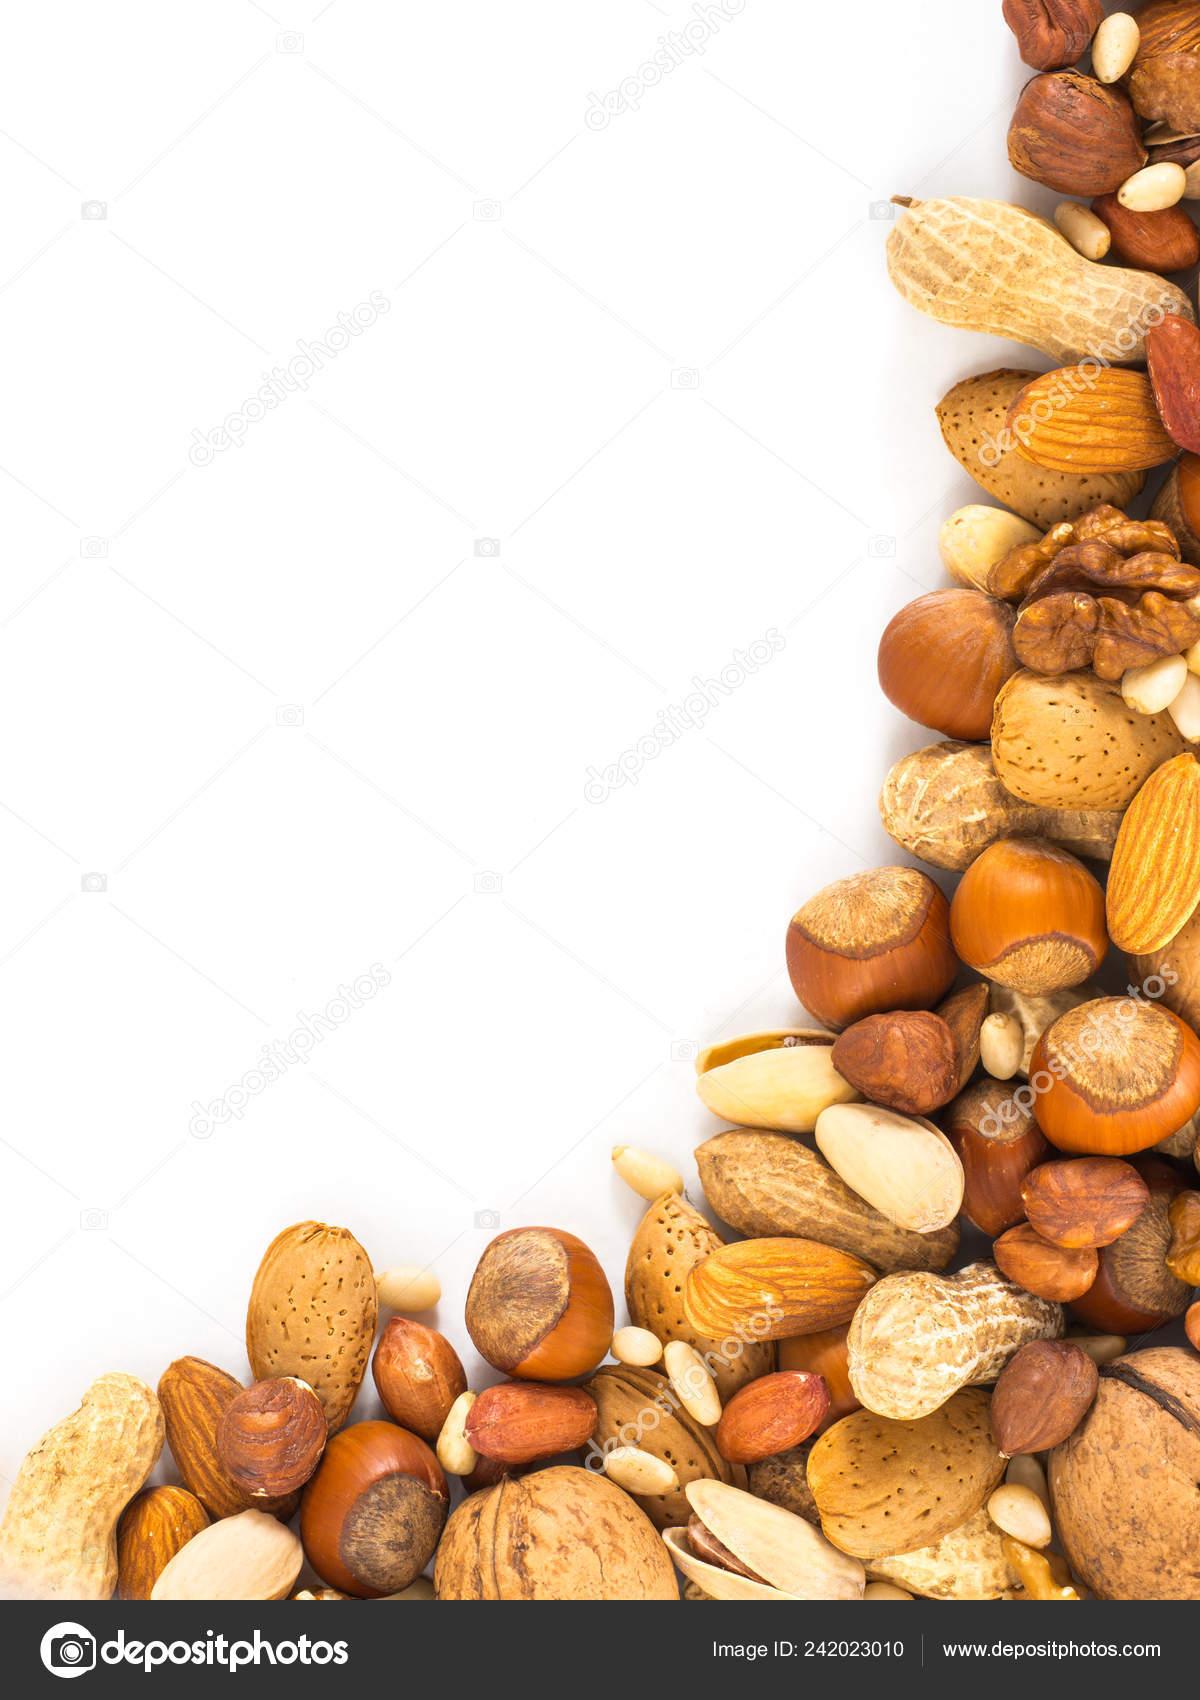 Background Mixed Nuts Hazelnuts Almonds Walnuts Pistachios